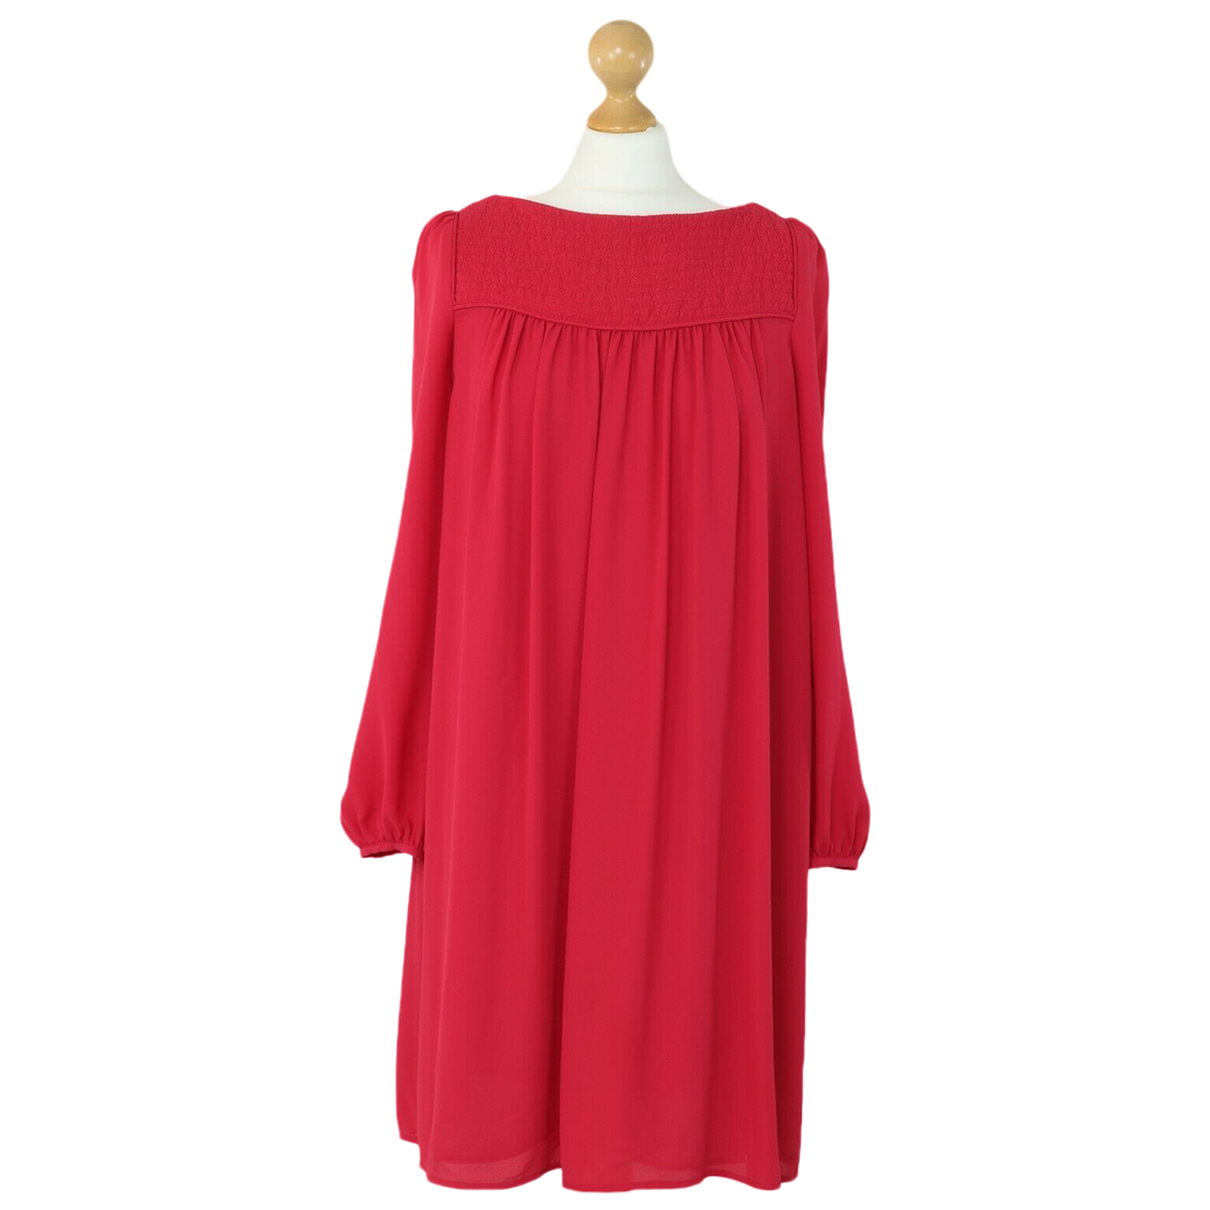 Claudie Pierlot \N Pink dress for Women 38 FR